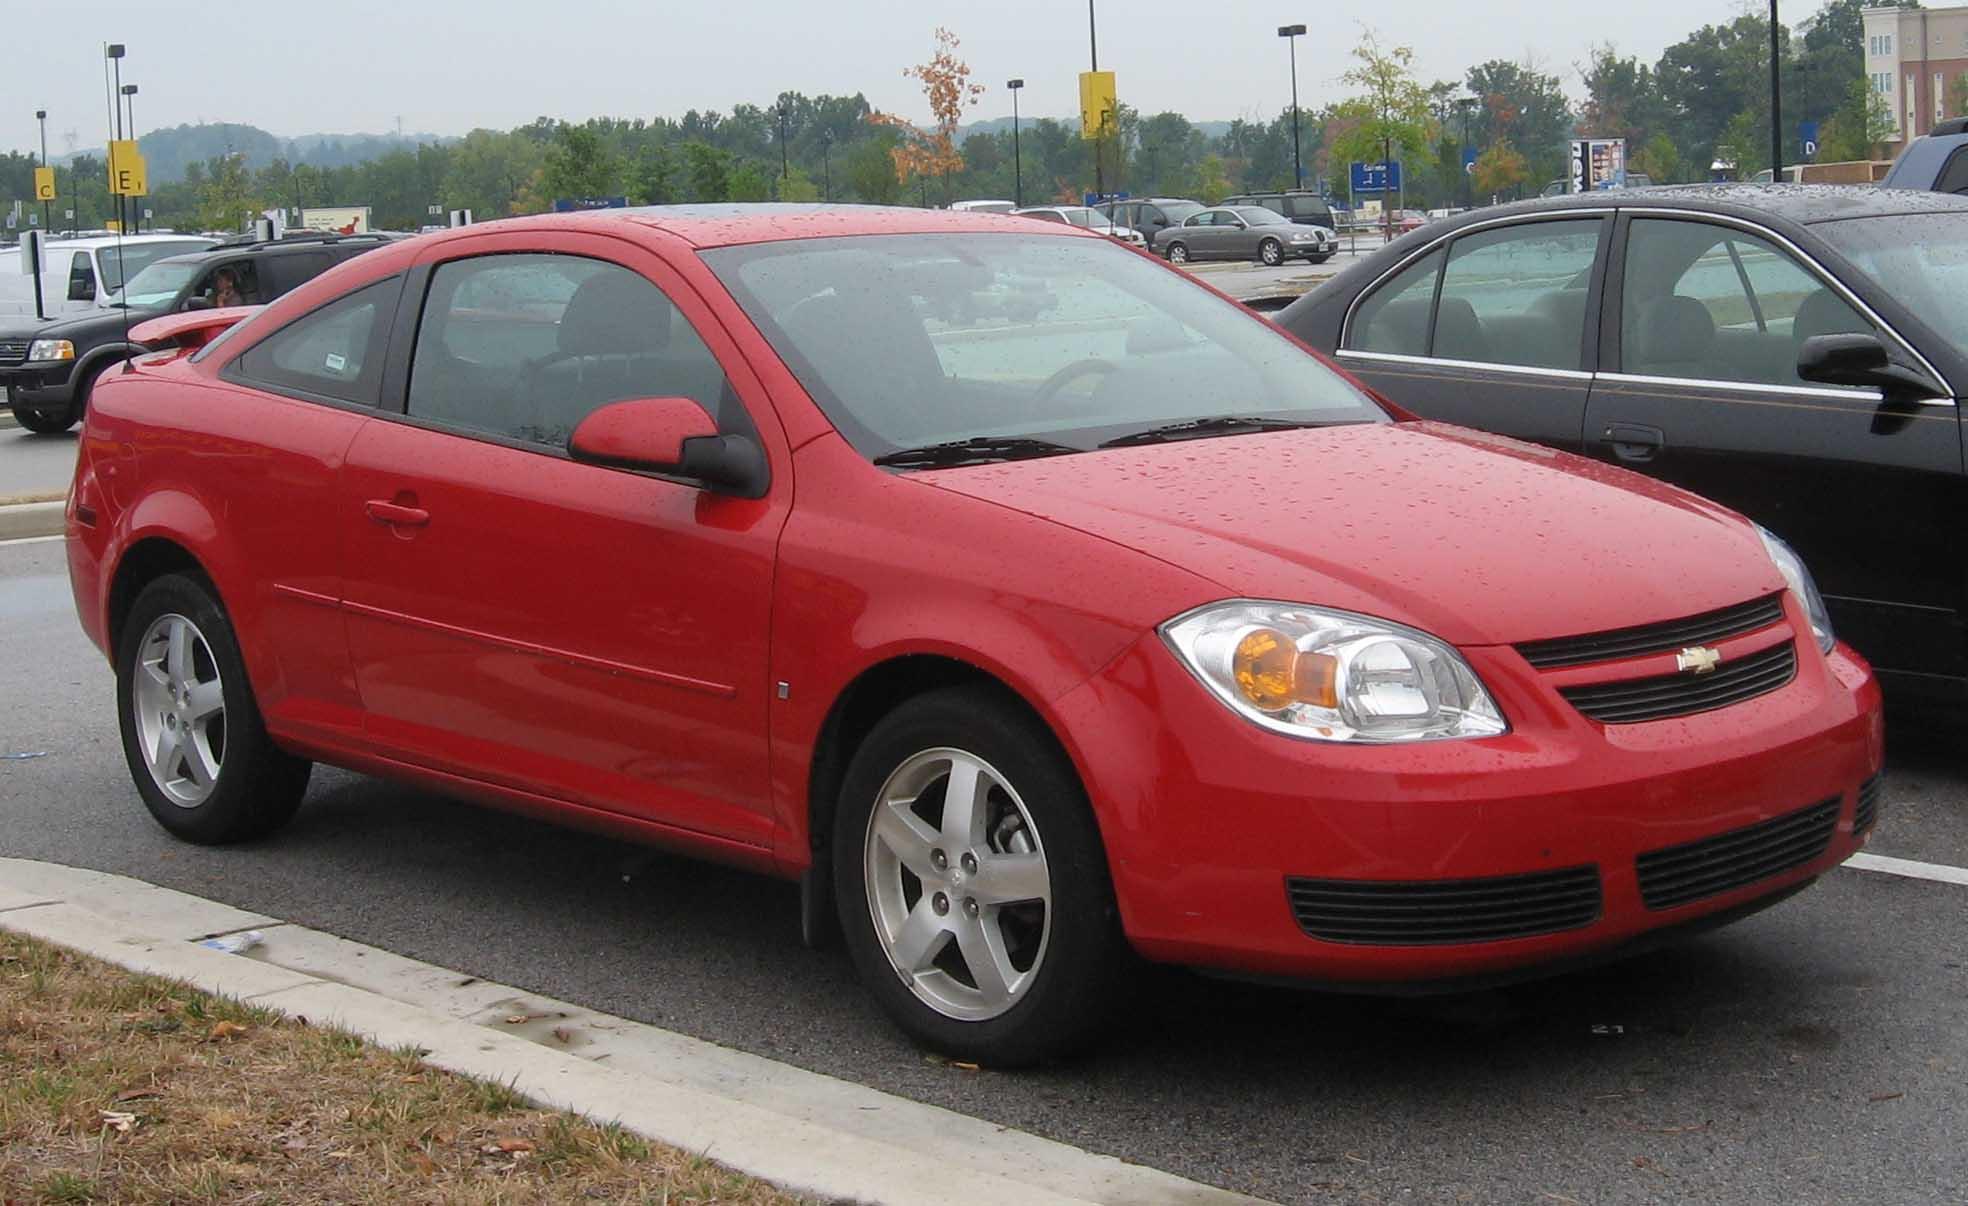 File:Chevrolet-Cobalt-Coupe.JPG